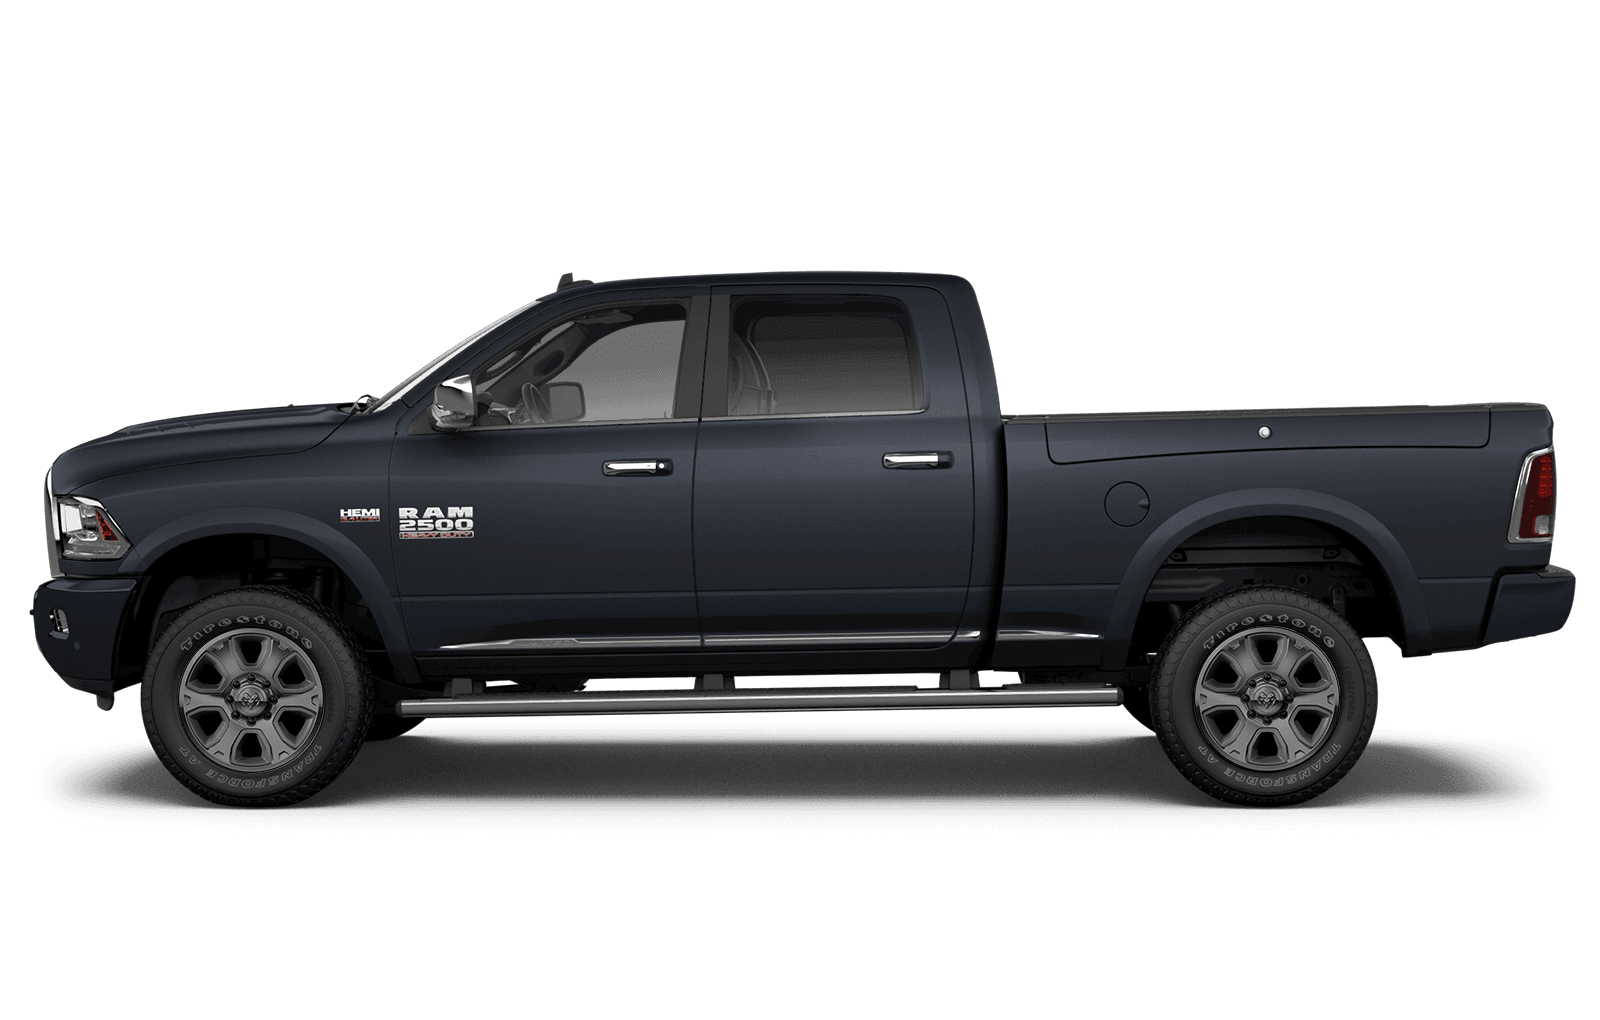 2018 RAM 2500 Pickup Truck   RAM Trucks Canada D Dodge Truck Wiring Diagram on